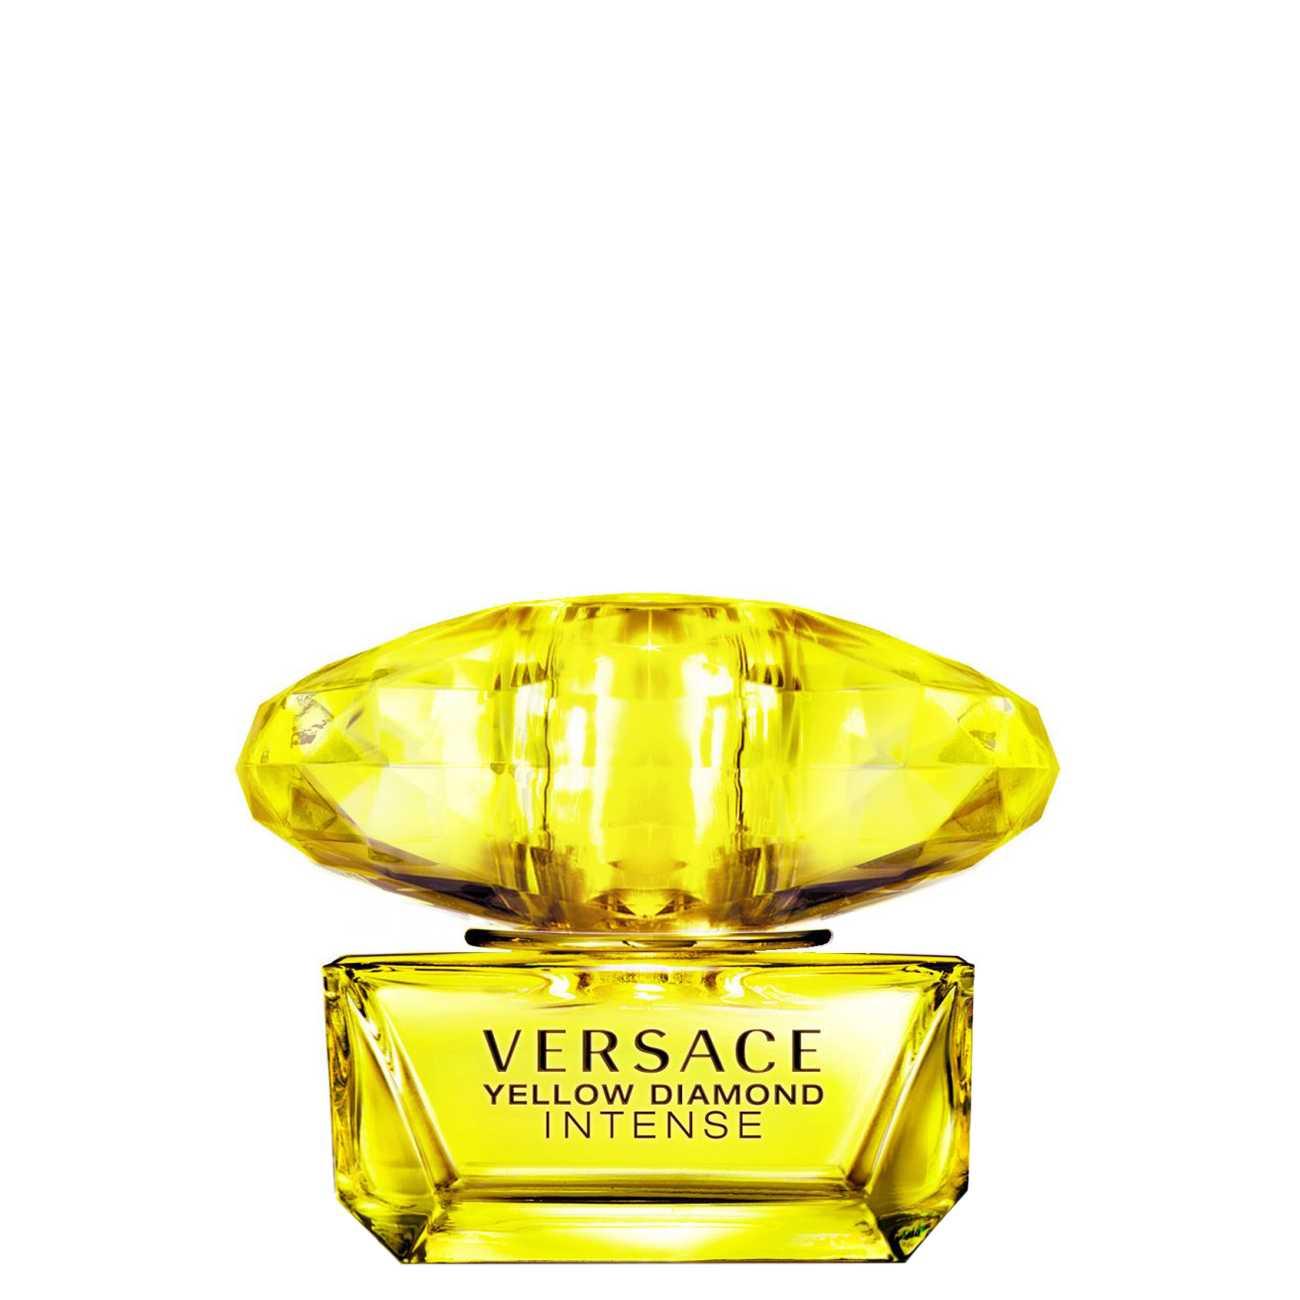 YELLOW DIAMOND INTENSE 50ml